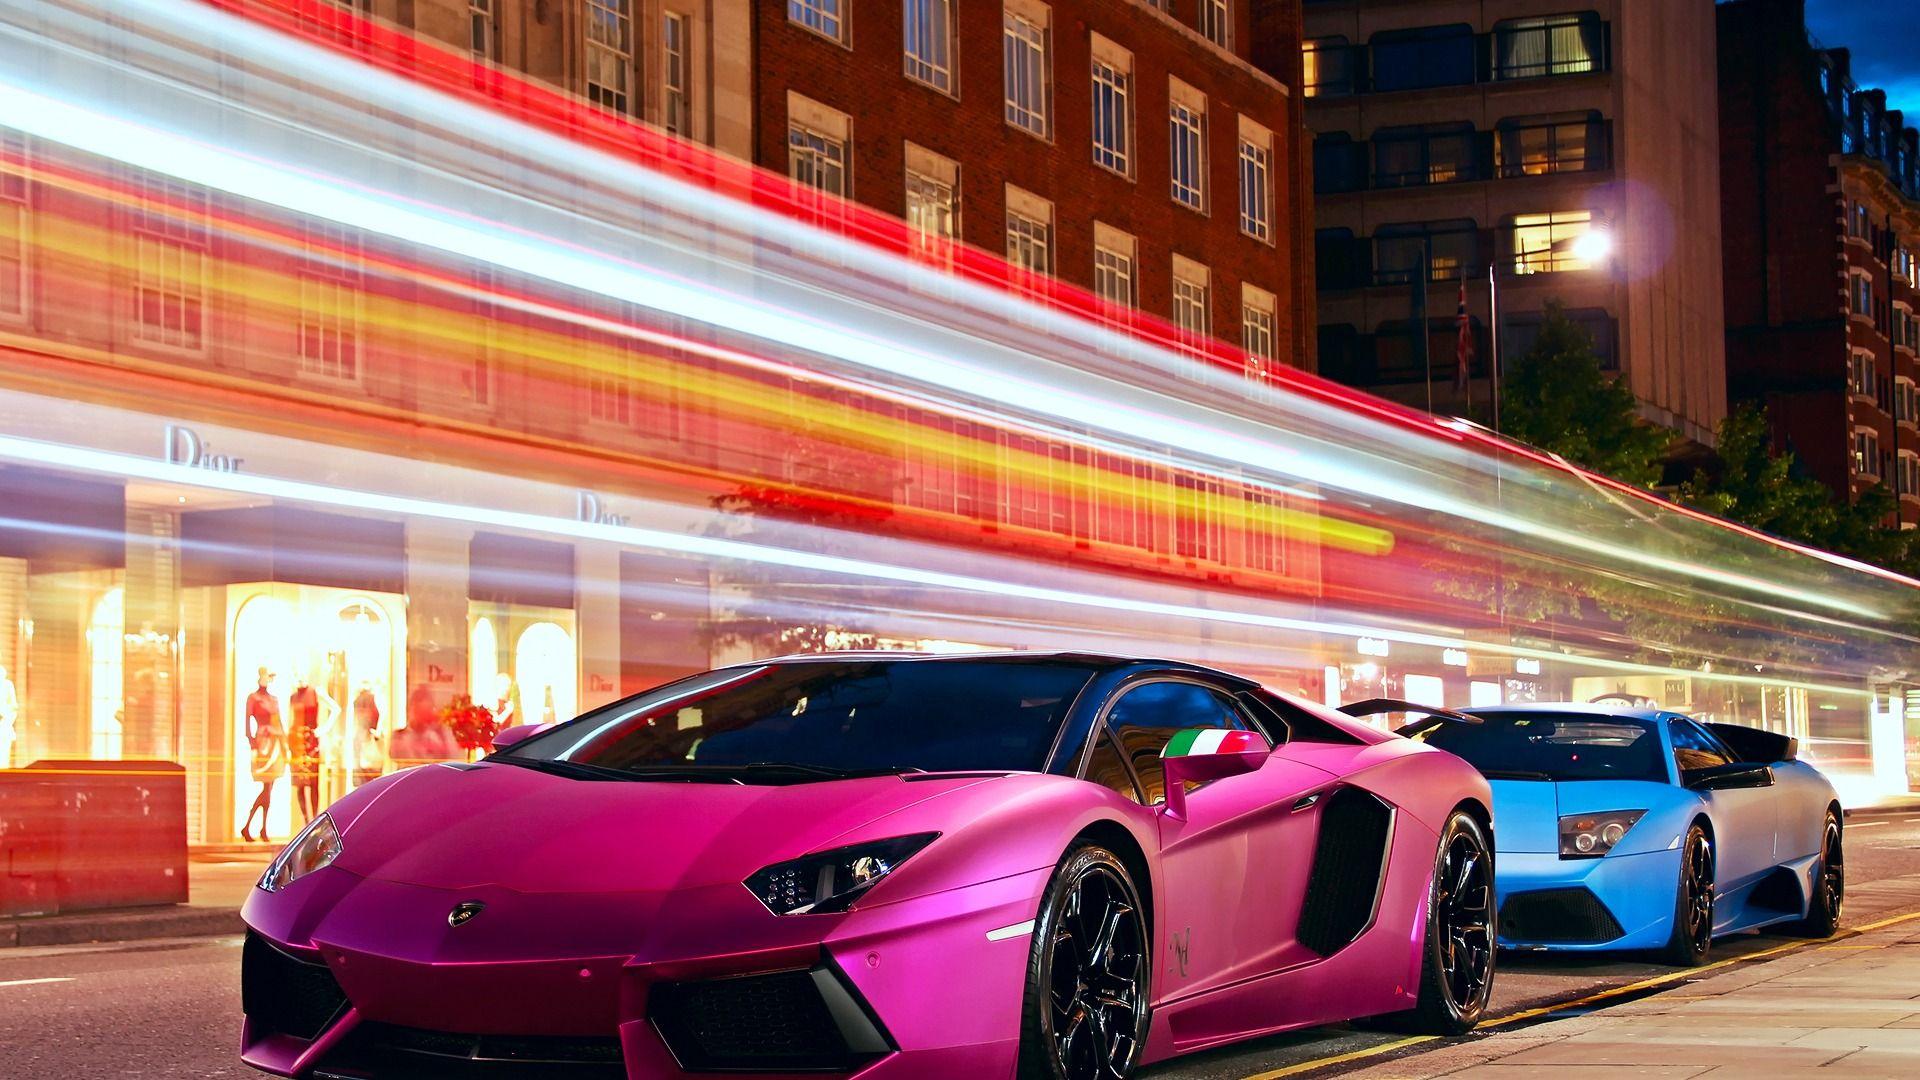 Pink and Blue Lamborghini HD Widescreen Wallpapers Car